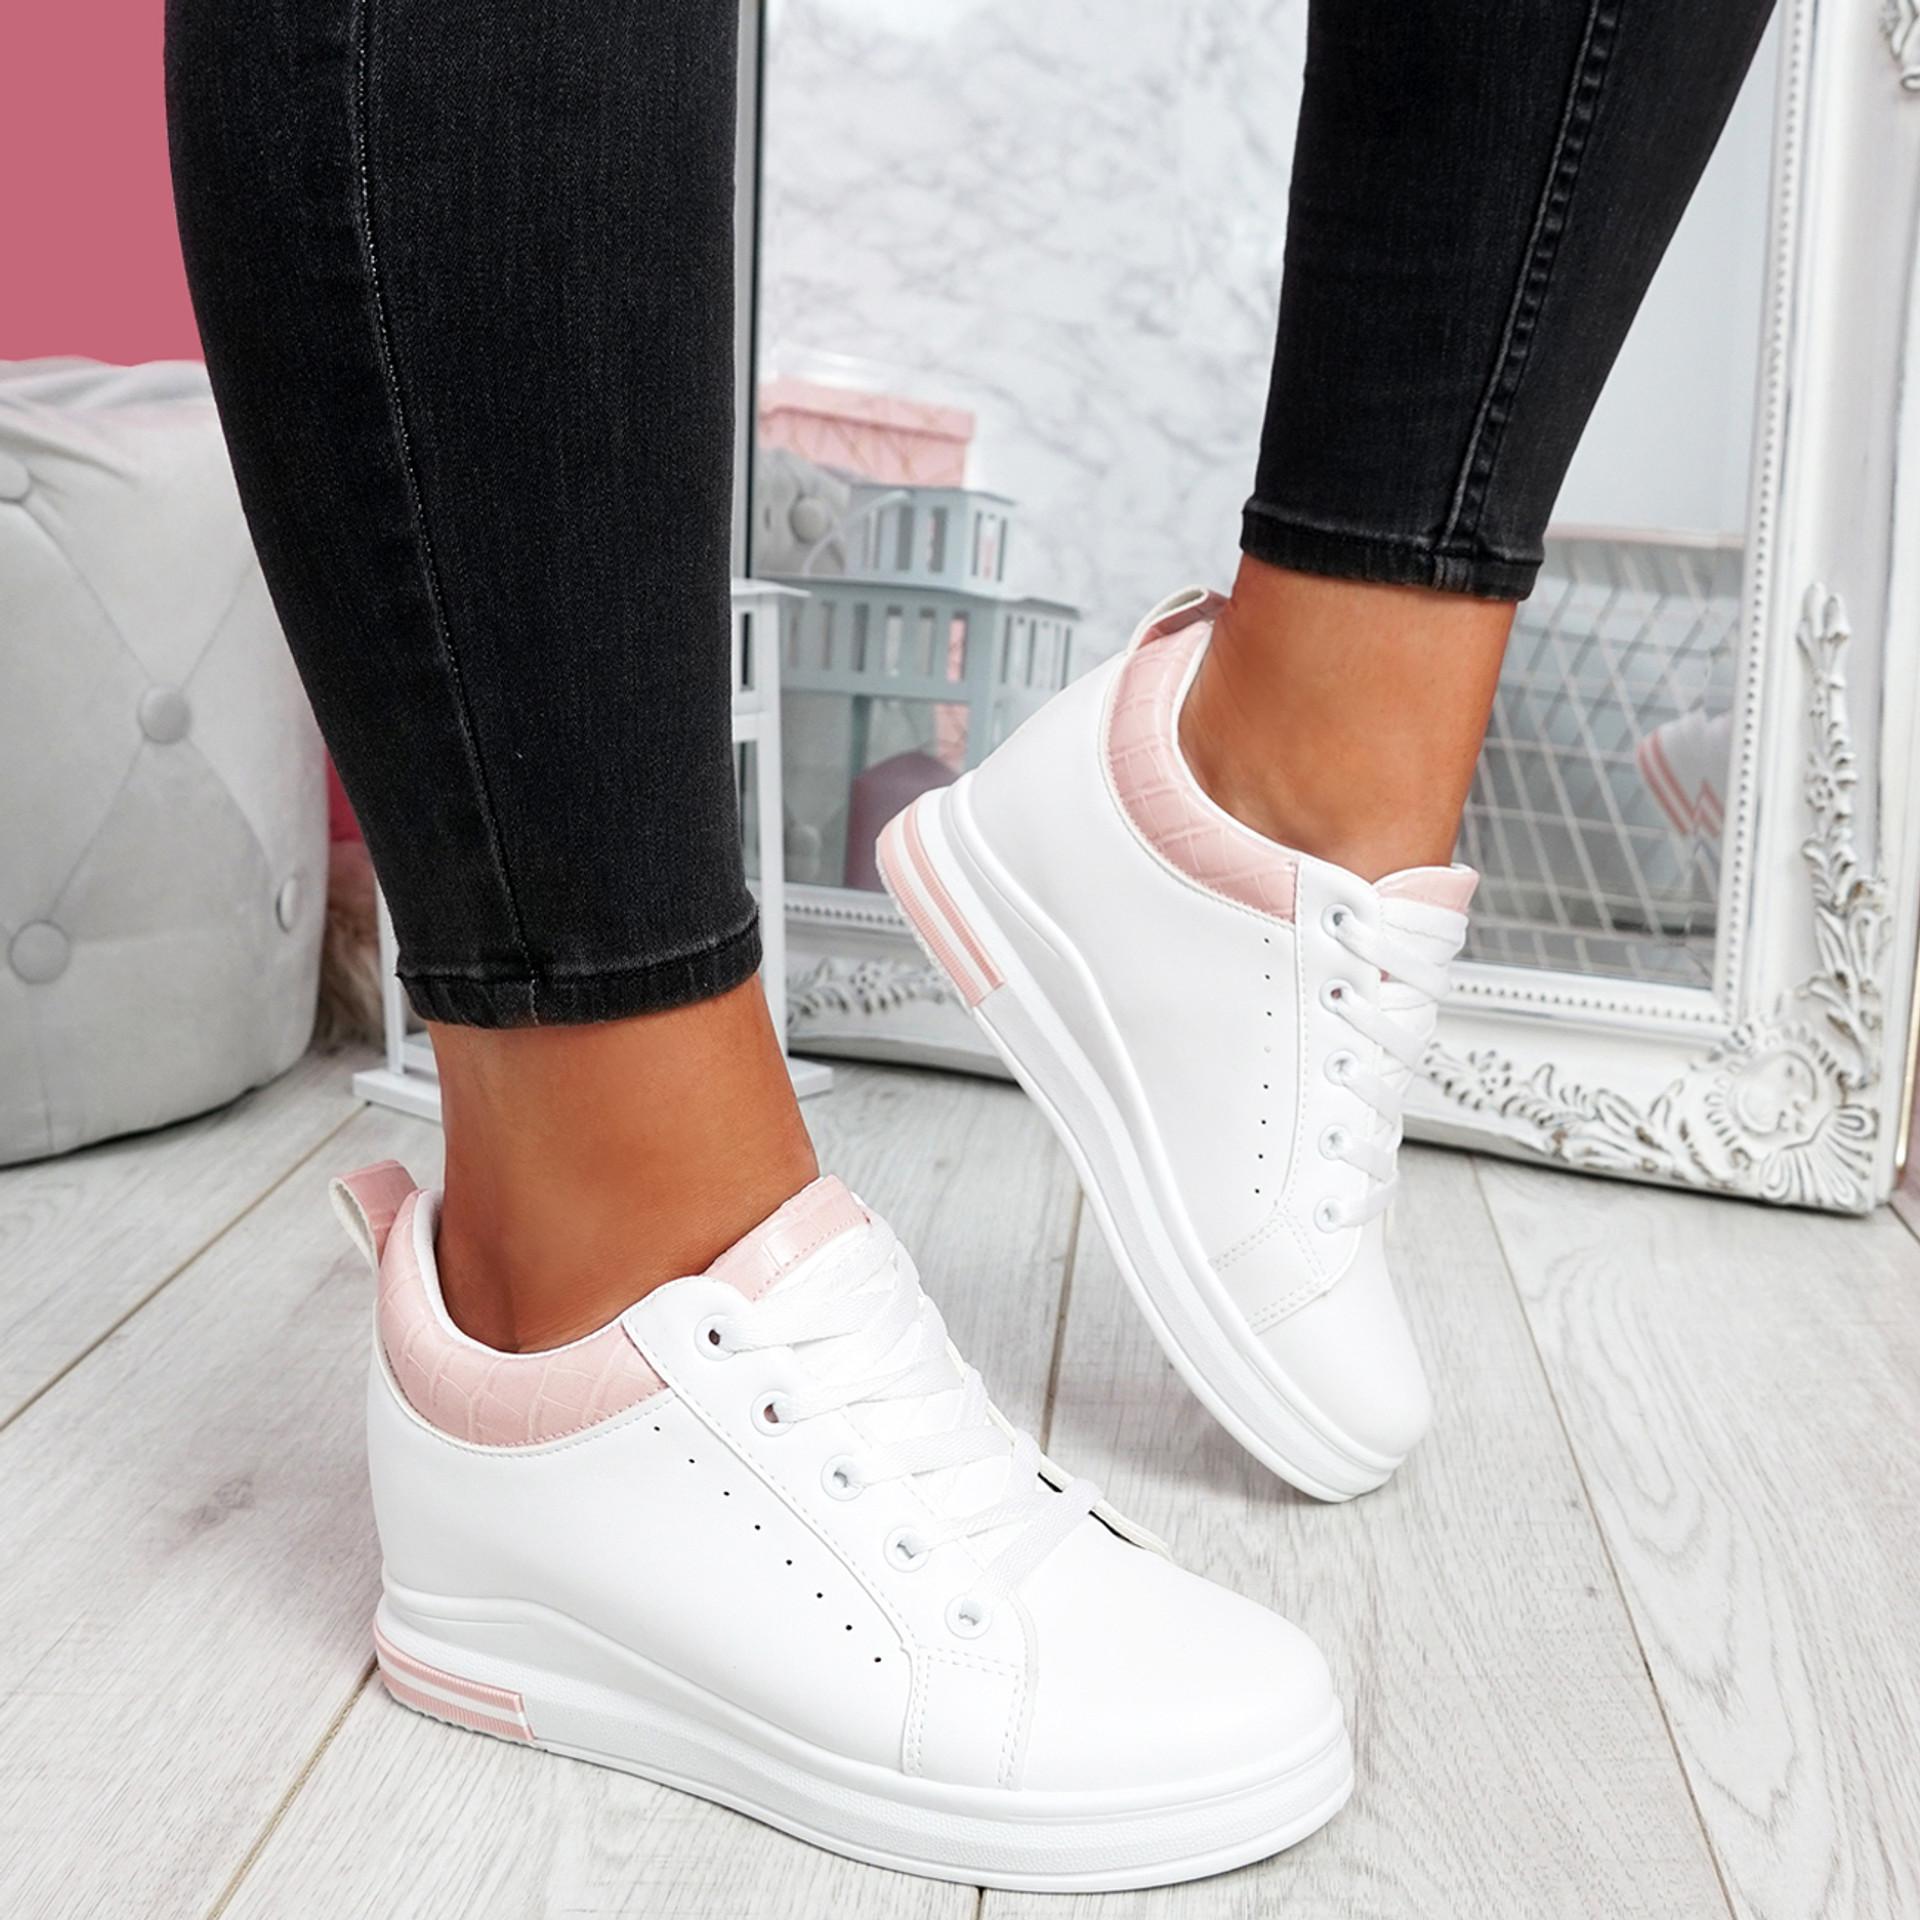 Pinna White Pink Wedge Trainers